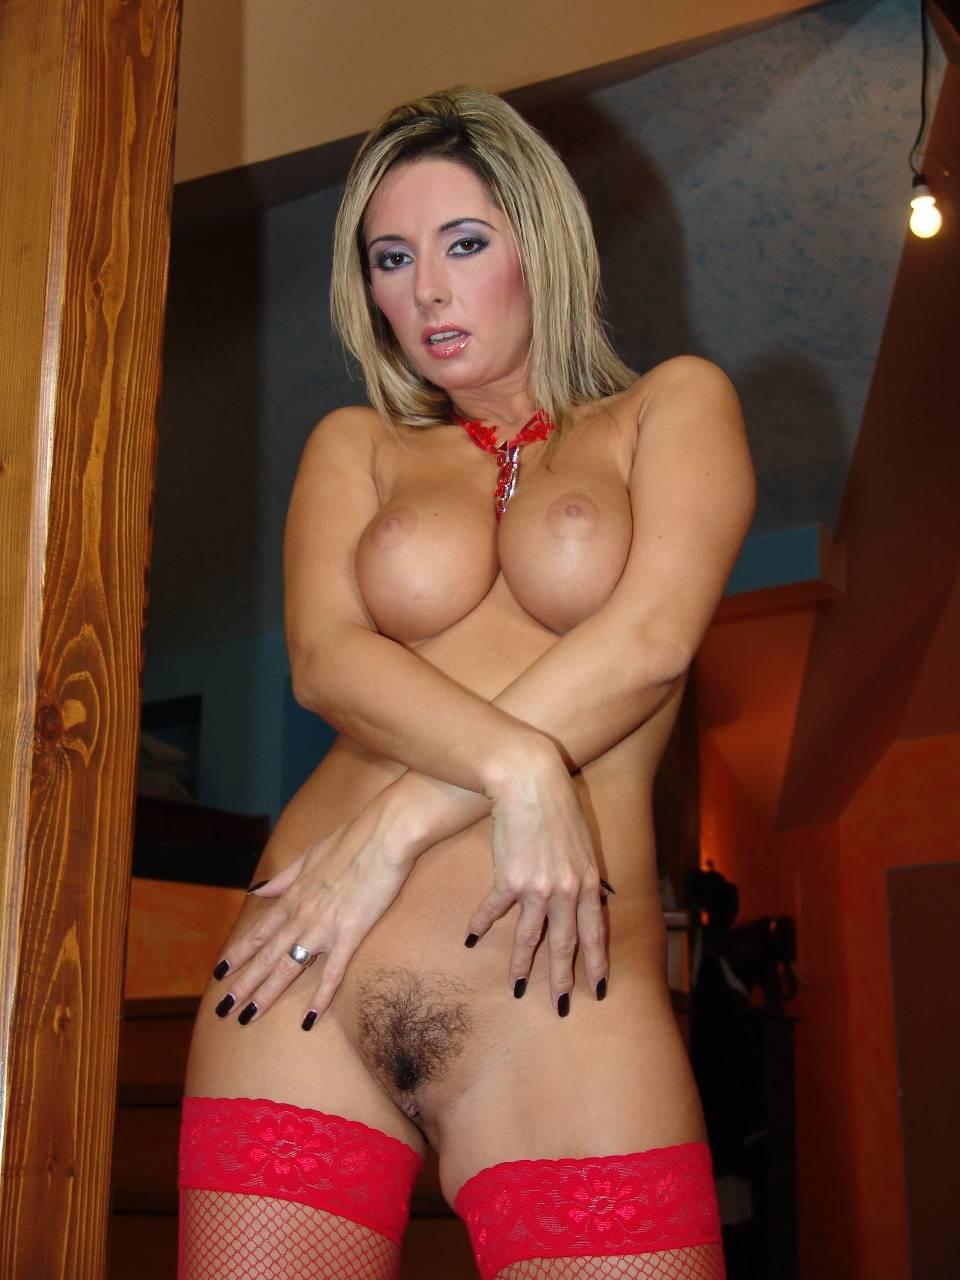 Hourglass figure nude mature women